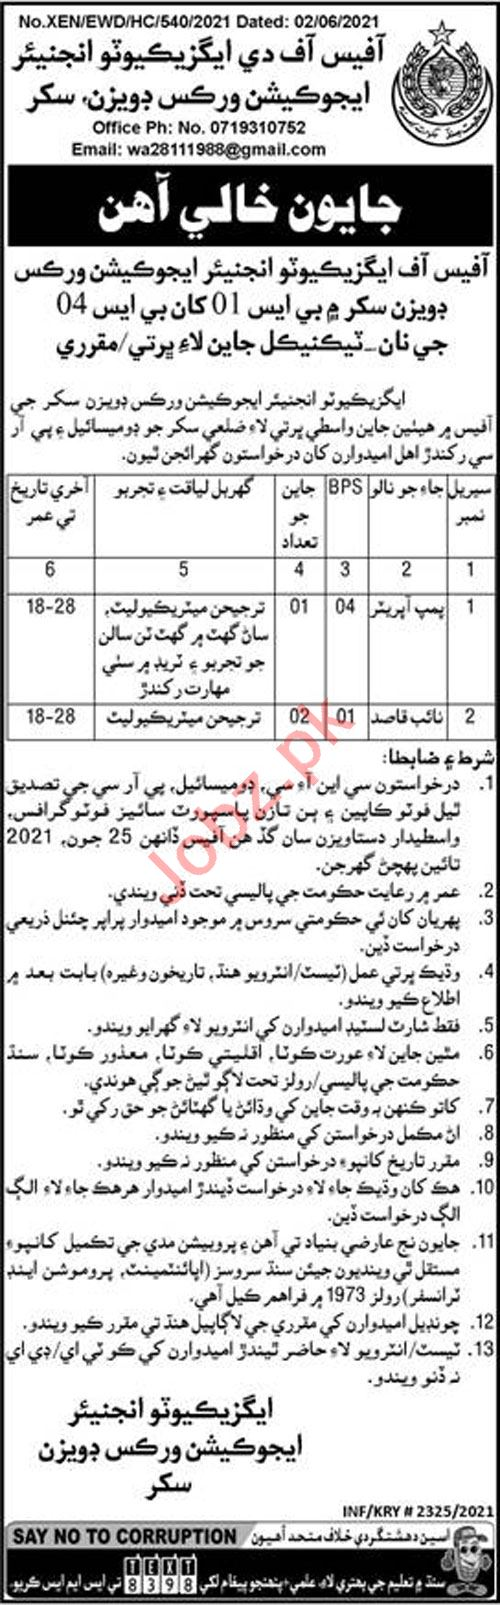 Education Works Division Sukkur Jobs 2021 for Naib Qasid